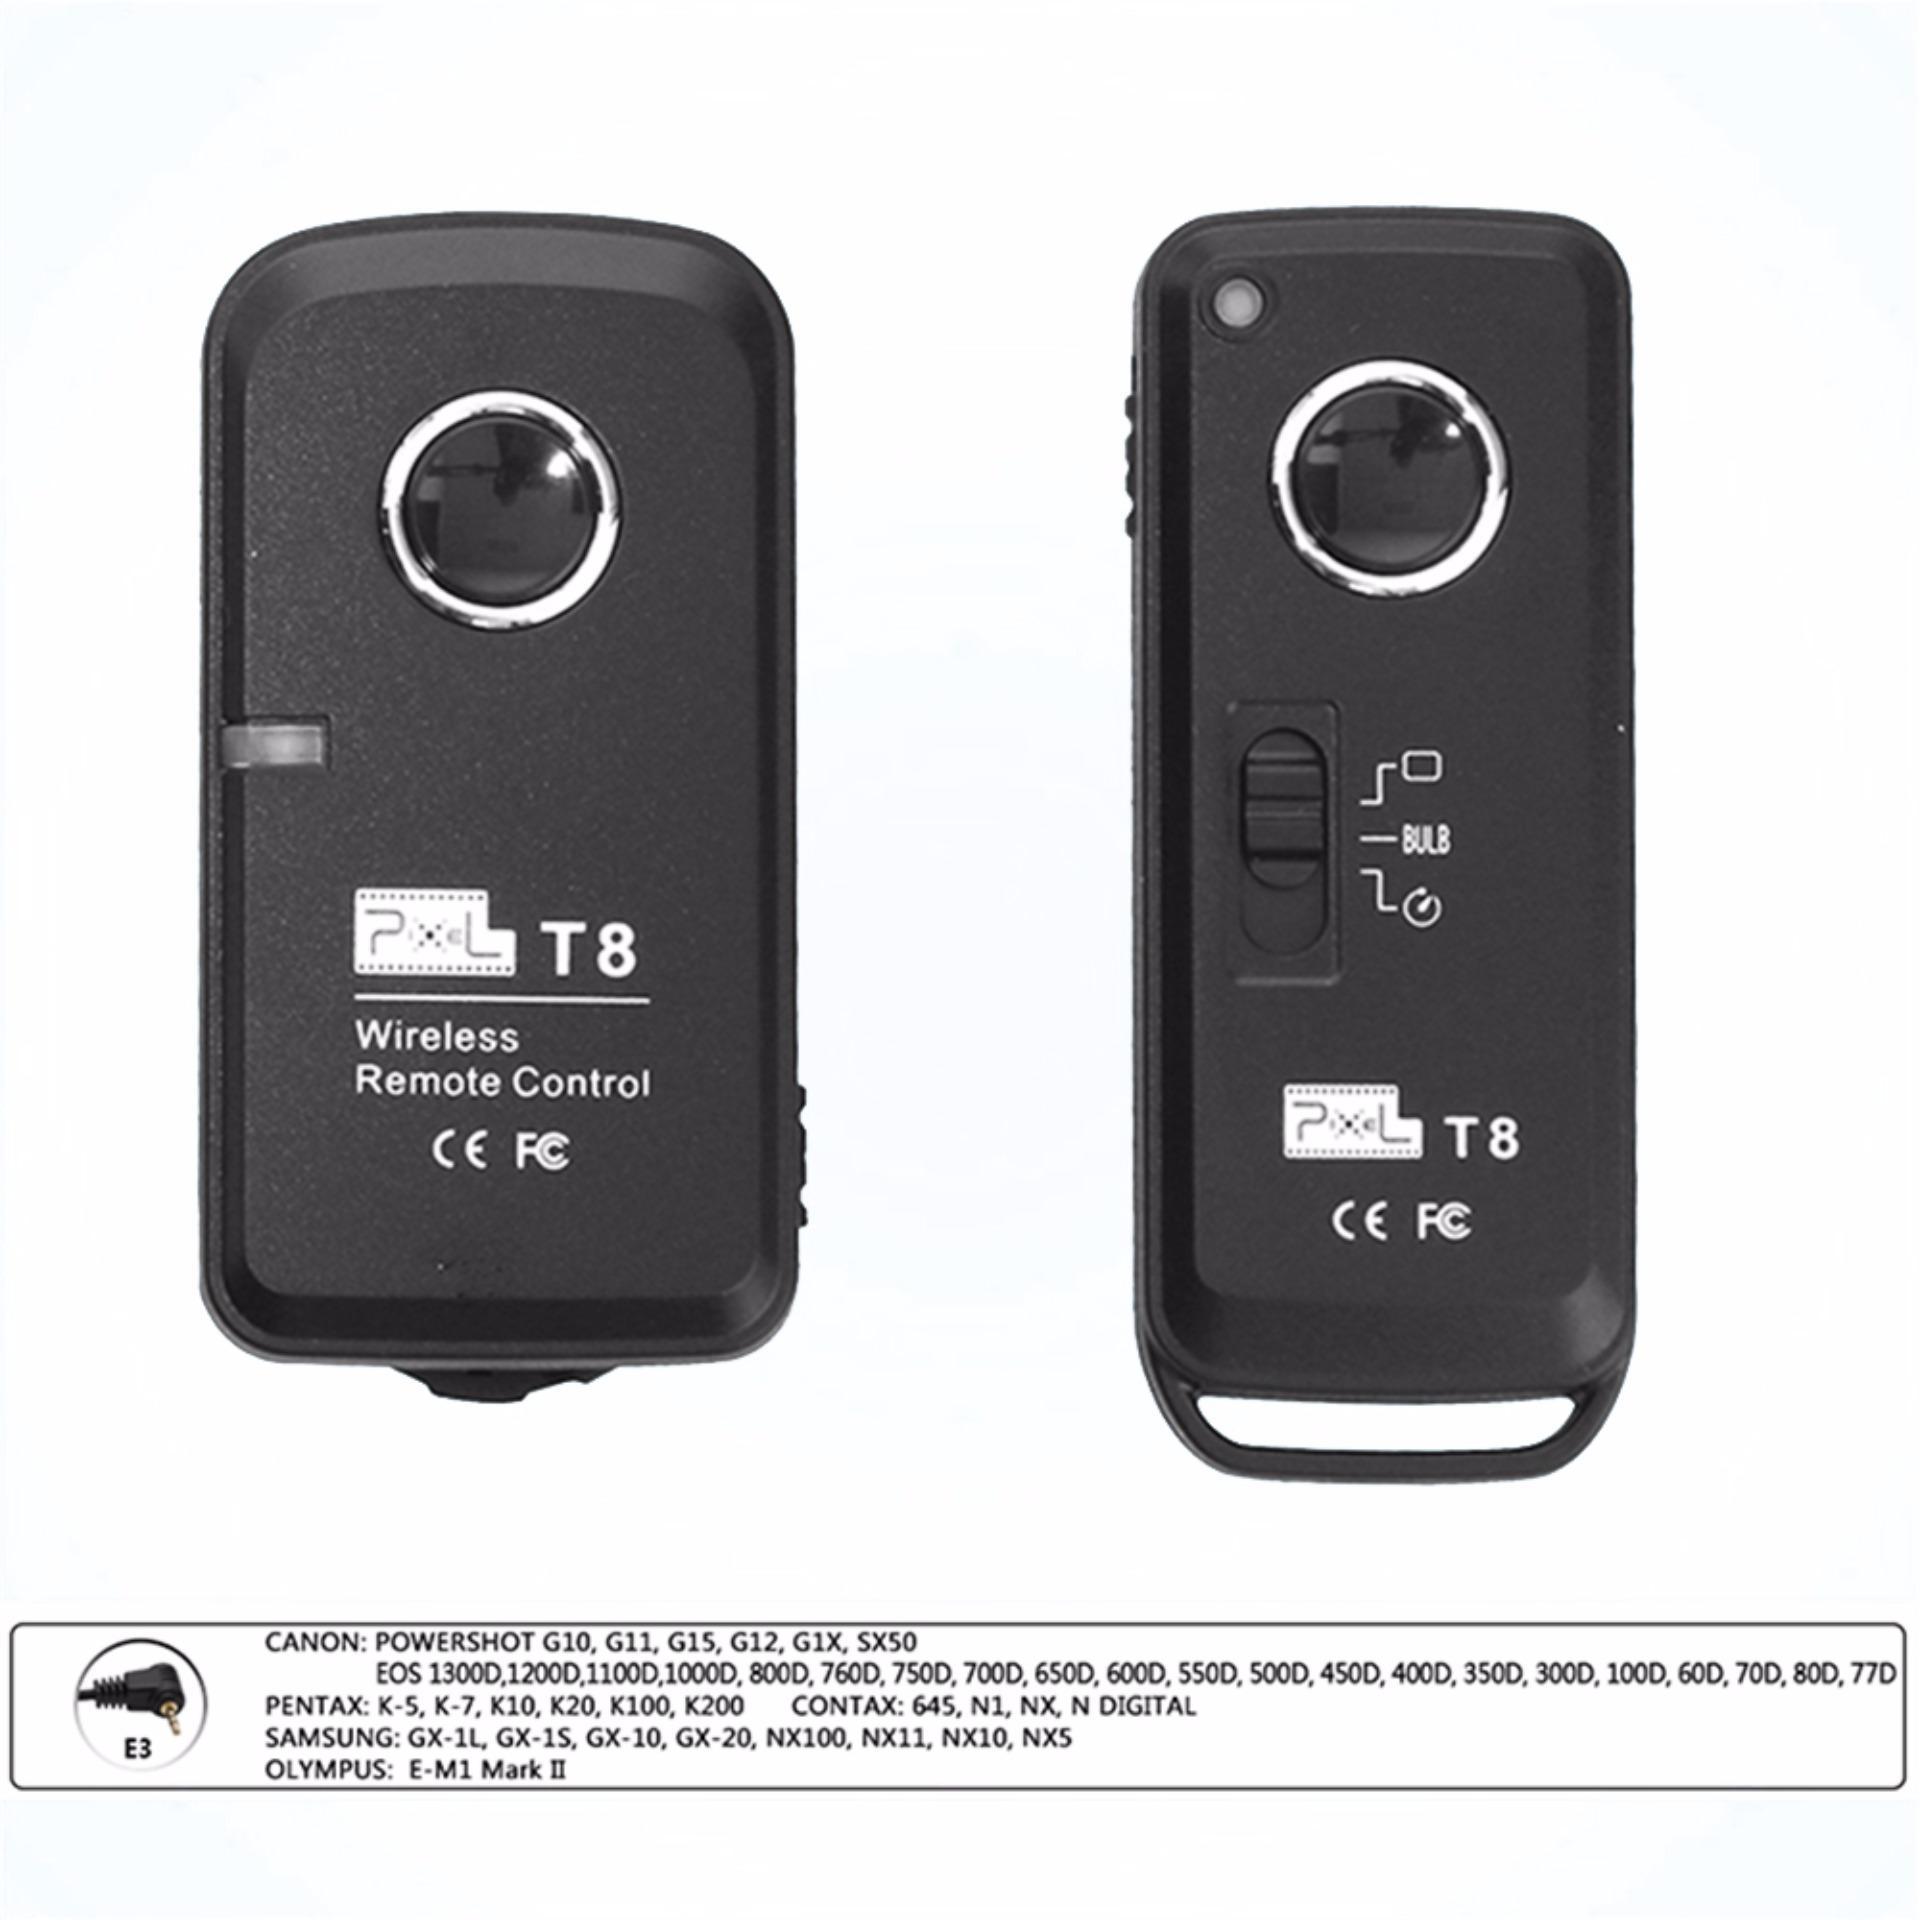 ... Pixel T8 E3 Wireless Shutter Release Remote Control for CanonPowershot G10 G11 G15 G12 G1X SX50 ...